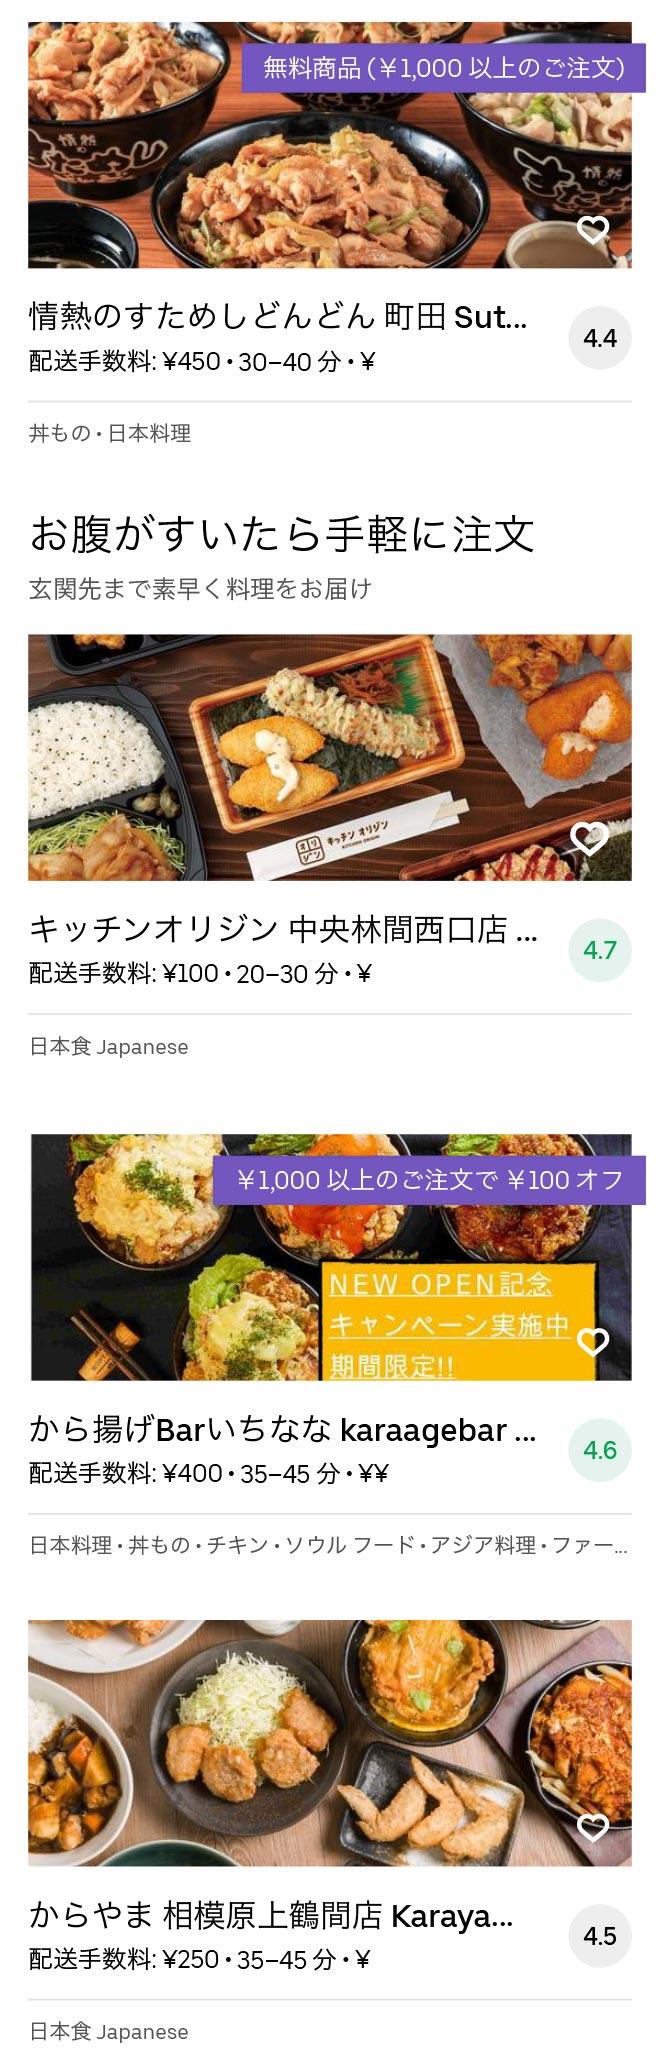 Chuo rinkan menu 2008 03